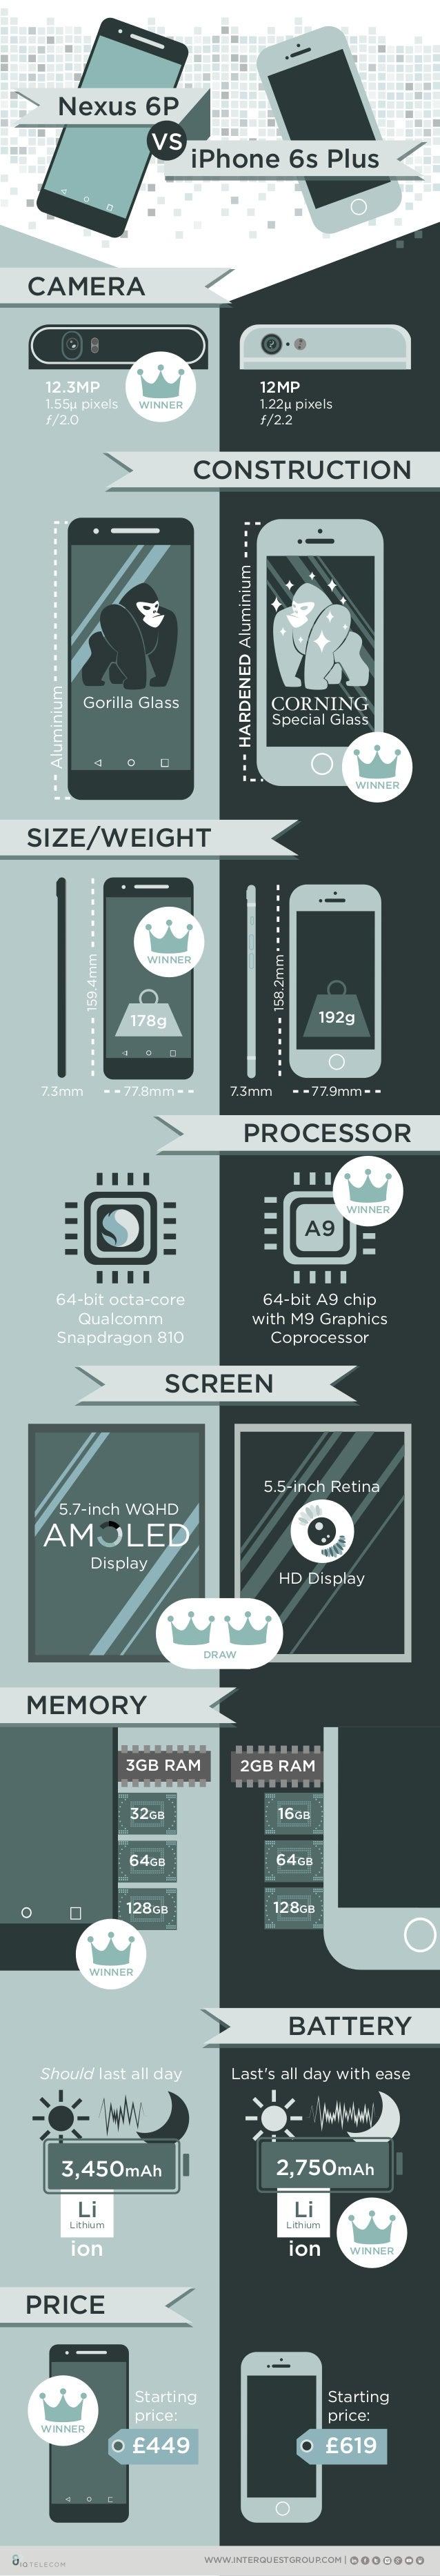 LiLithium ion LiLithium 3GB RAM 2GB RAM 128GB 64GB 32GB 128GB 64GB 16GB WWW.INTERQUESTGROUP.COM 178g 192g A9 3,450mAh 2,75...